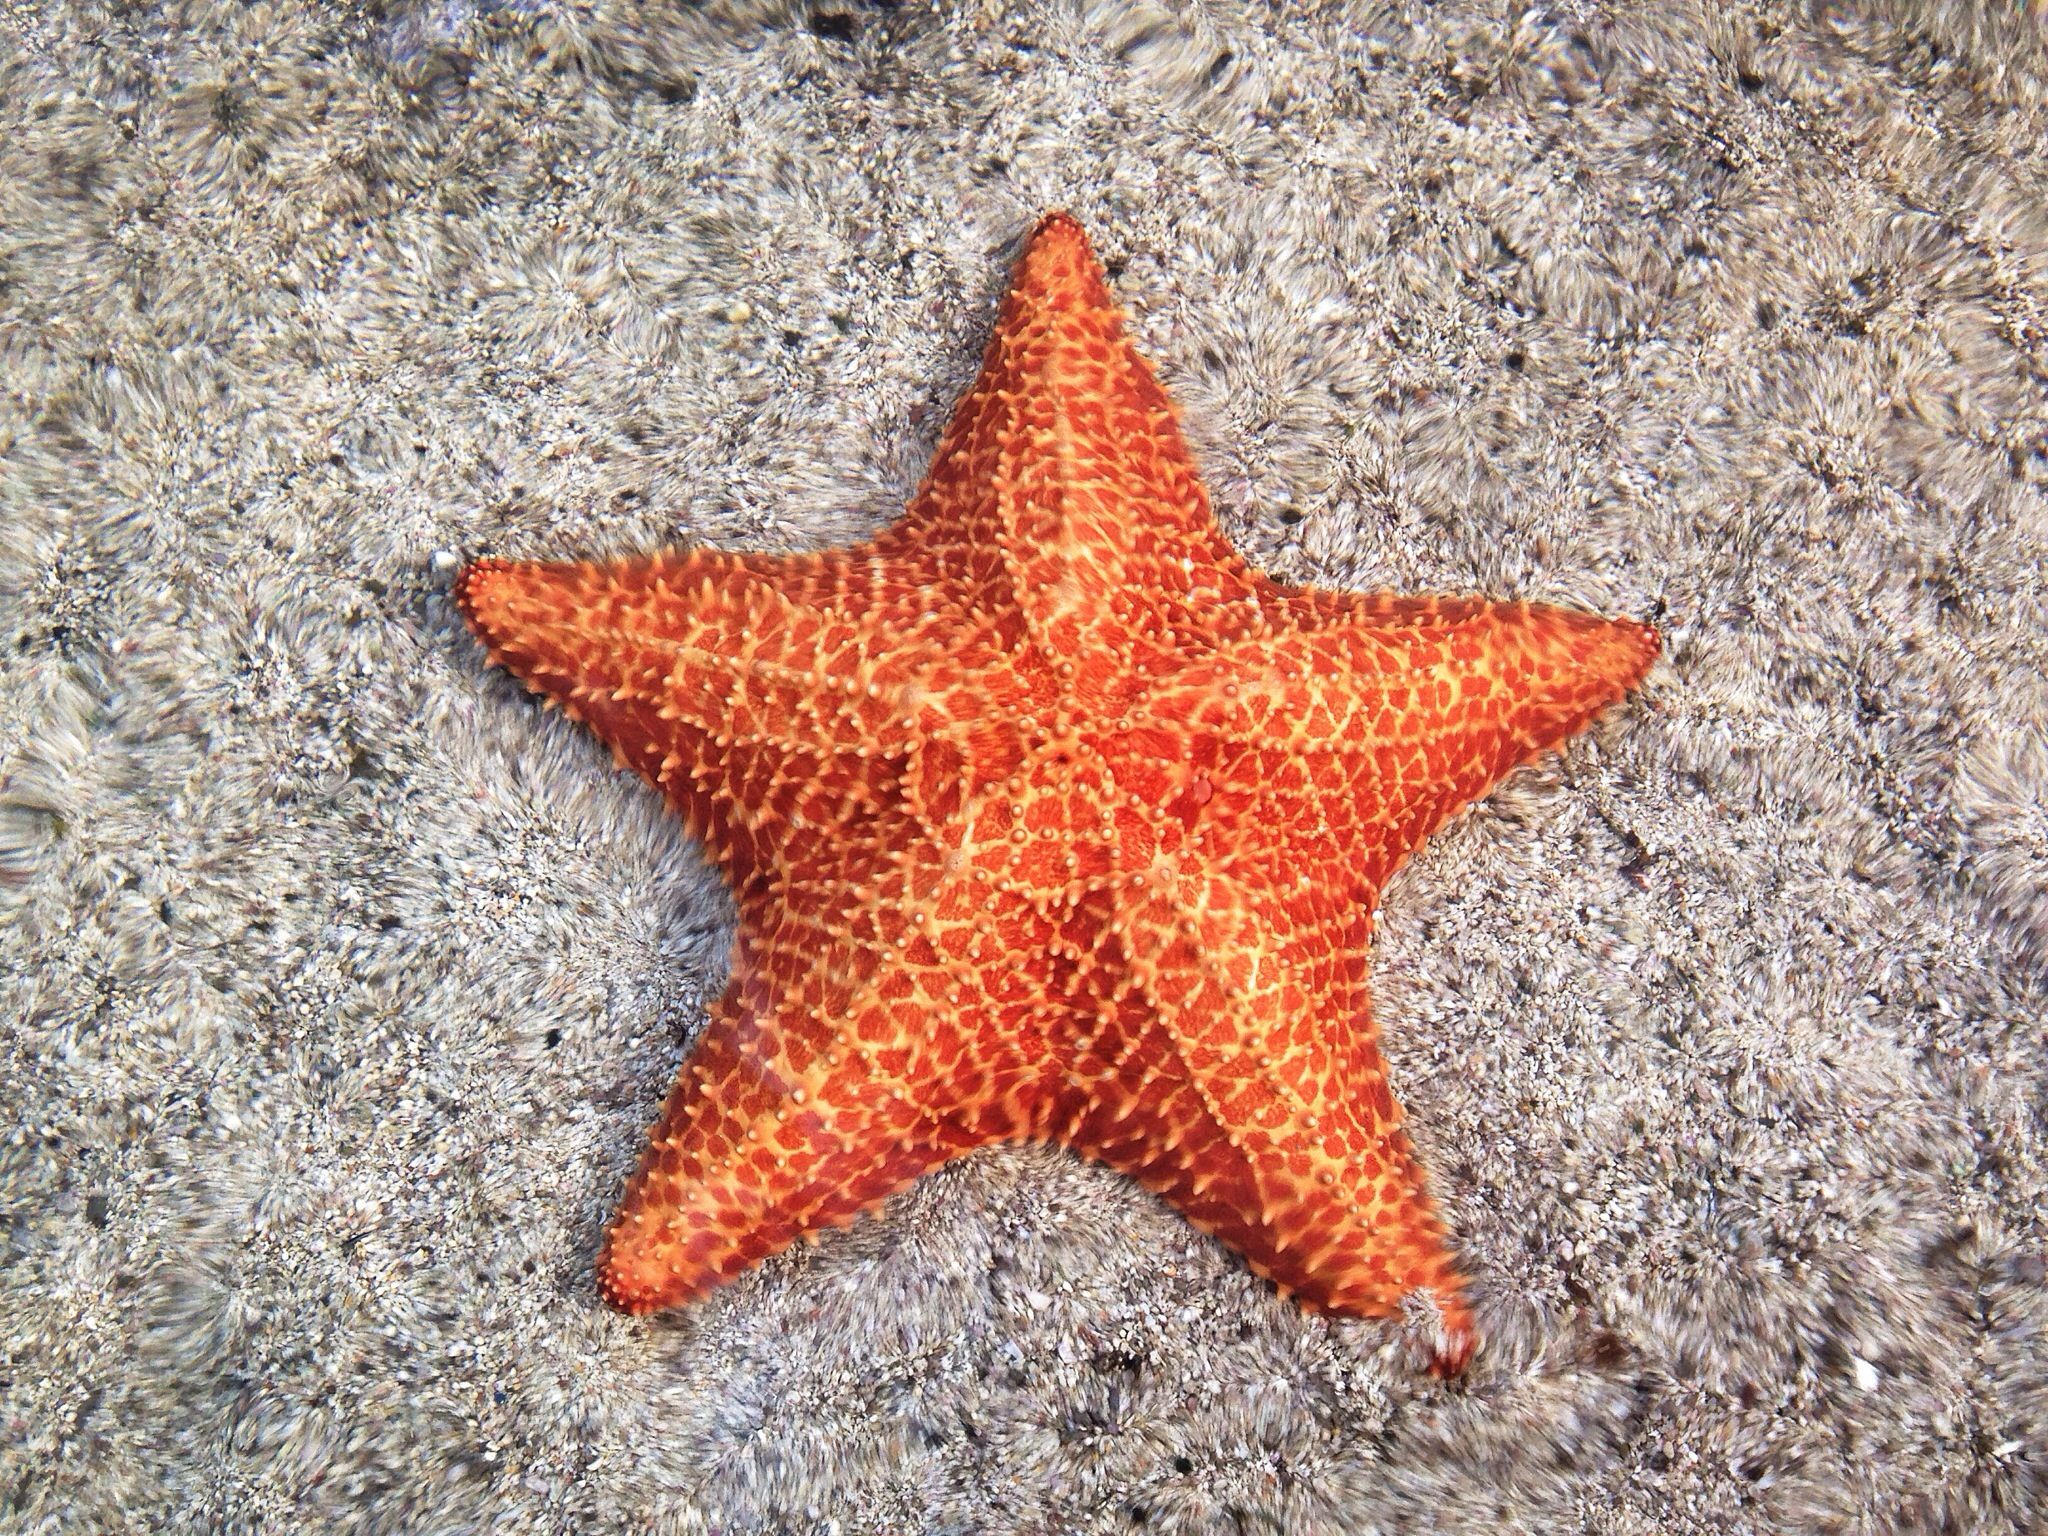 Buying Starfish